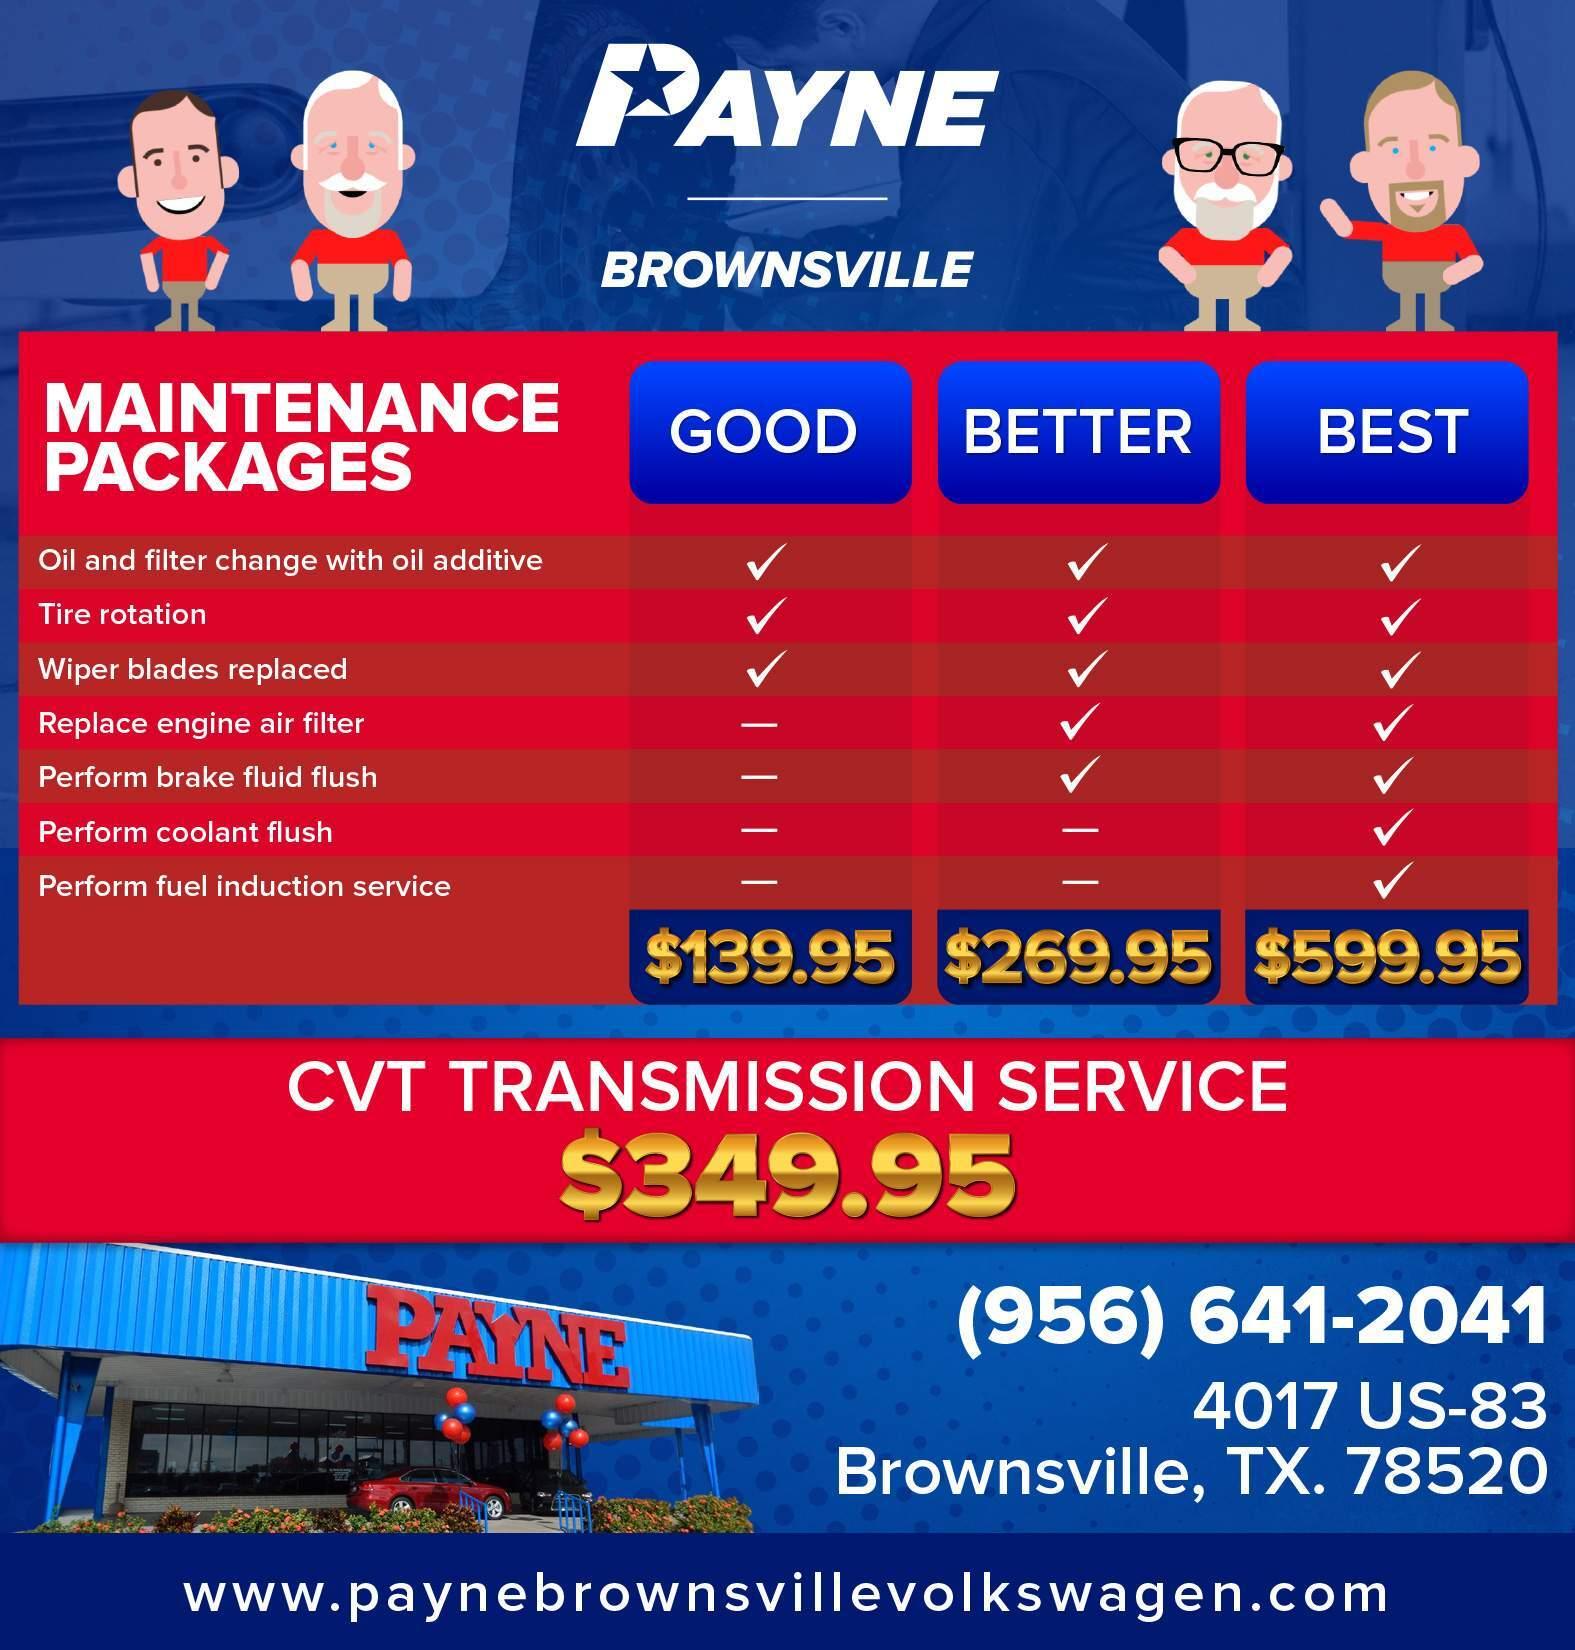 Volkswagen Gas Maintenance Packages Payne Brownsville Volkswagen